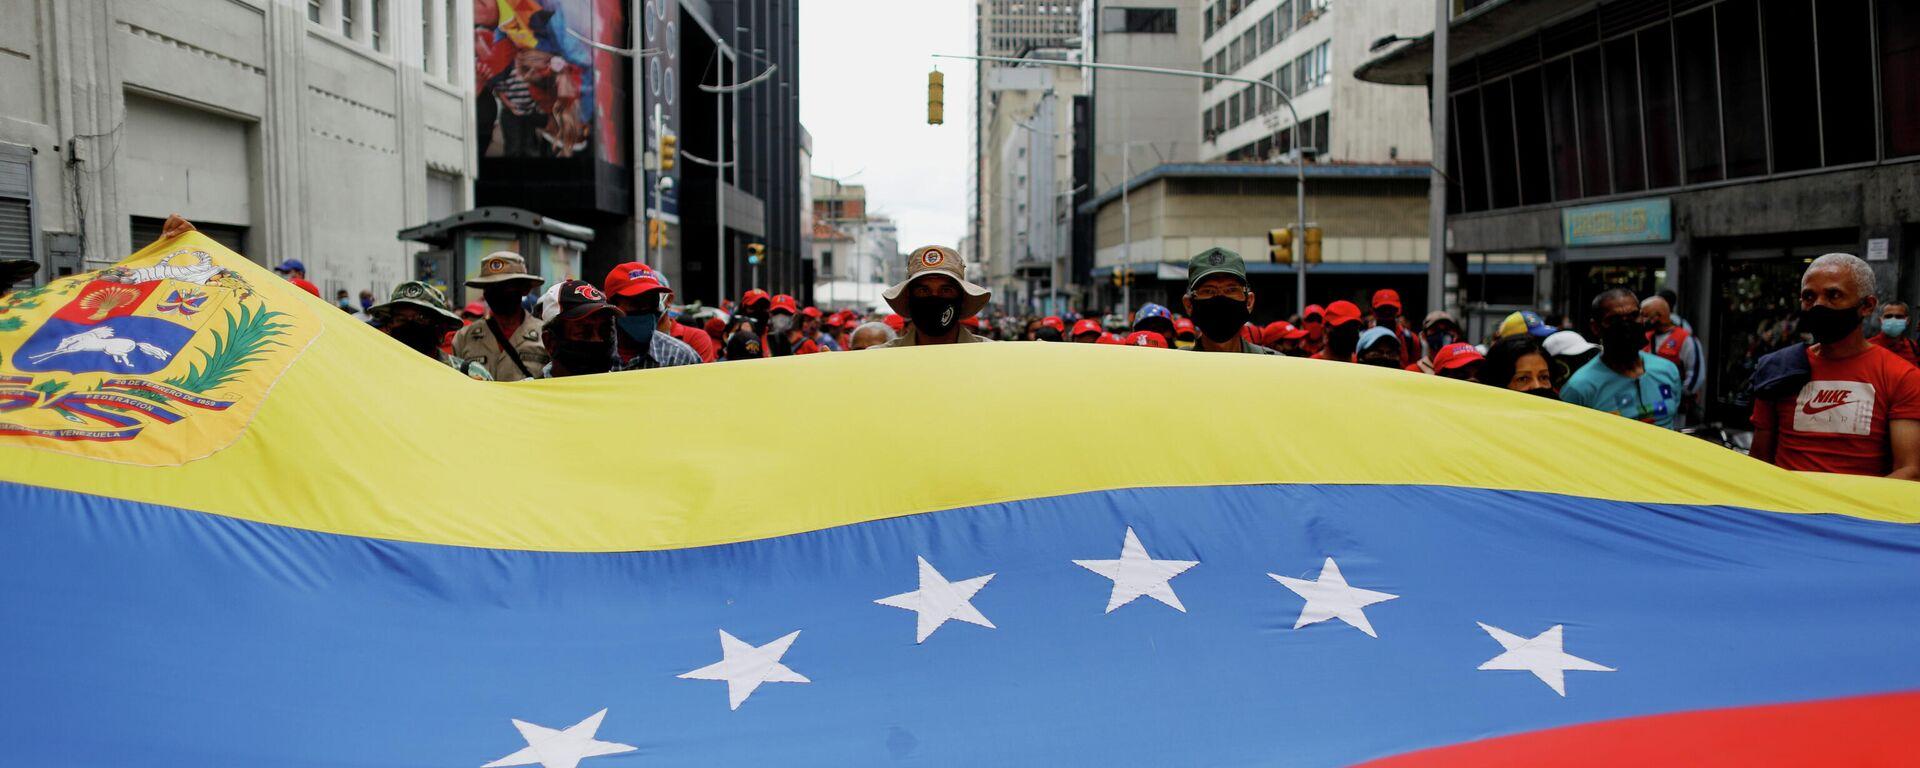 La bandera opositora de Venezuela - Sputnik Mundo, 1920, 13.05.2021